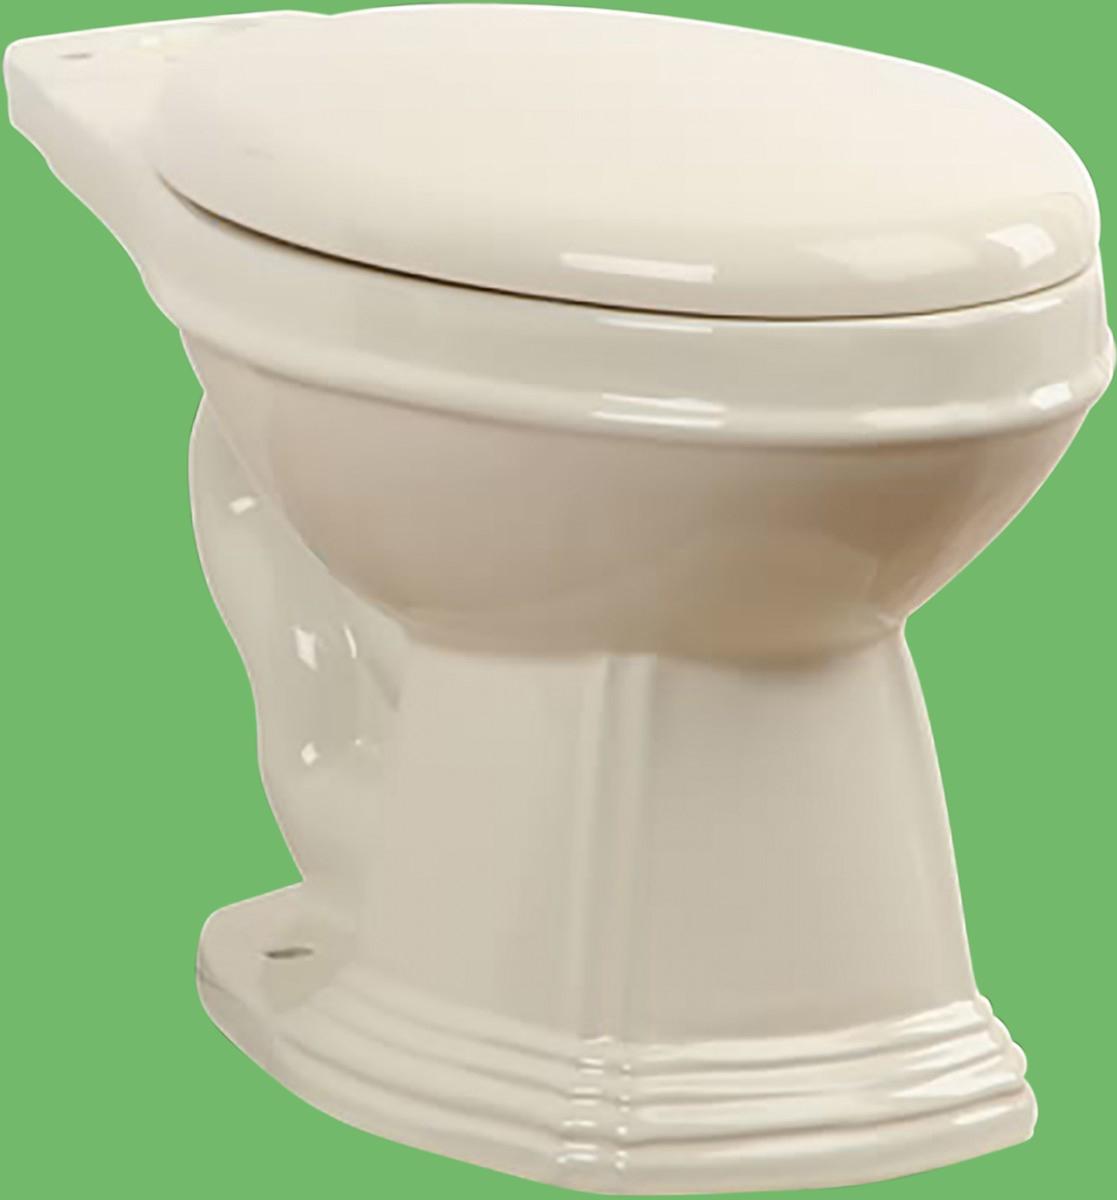 Pleasant Toilet Part Bone Sheffield 19 Elongate Toilet Bowl Only Ibusinesslaw Wood Chair Design Ideas Ibusinesslaworg